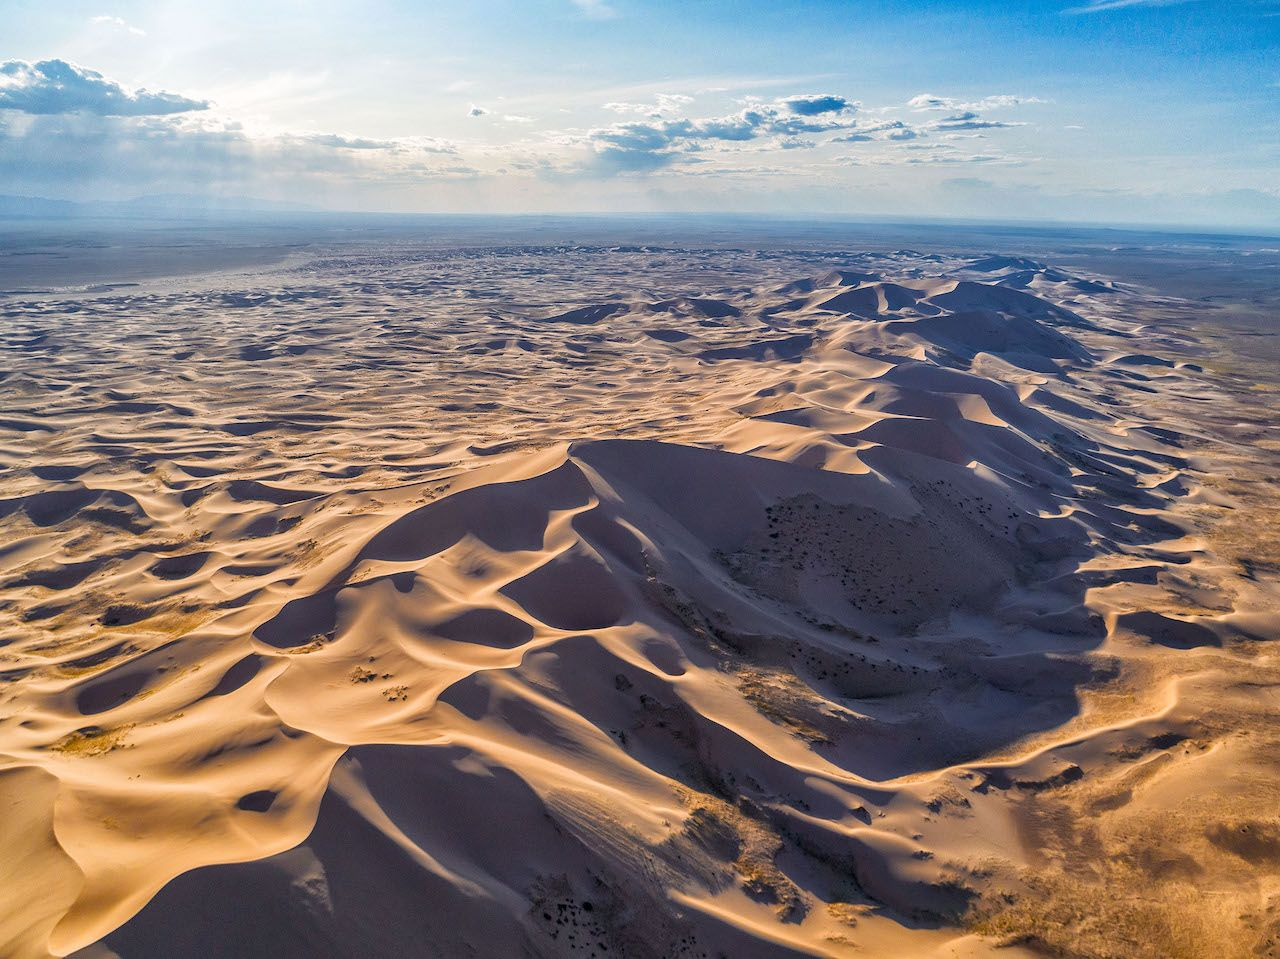 Mongolia sand dunes